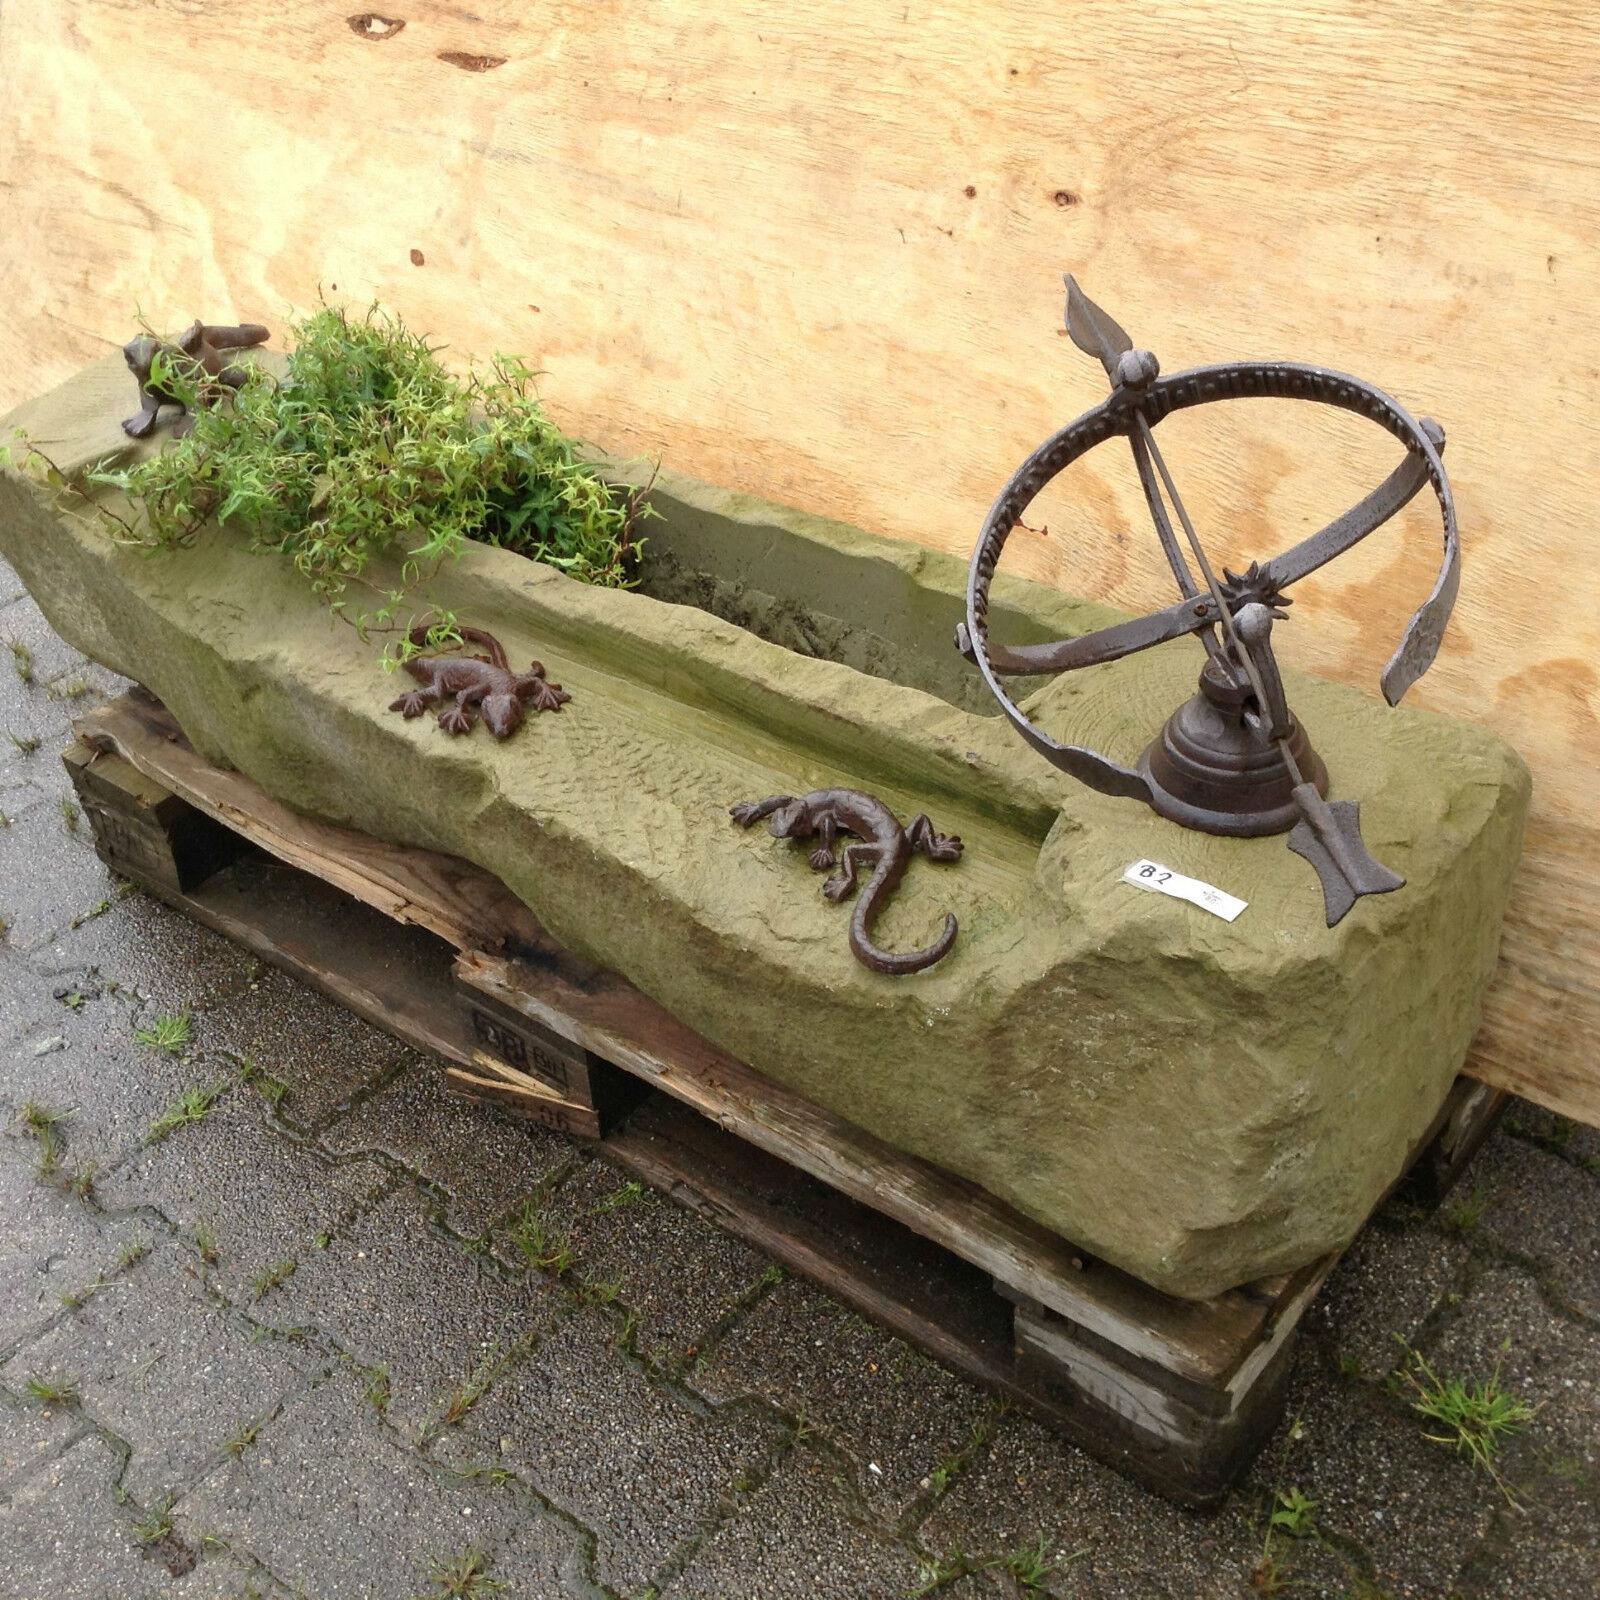 Garden Path Stream Pond Natural Stone Trough Fountain Bird Bath Sundial Lizard